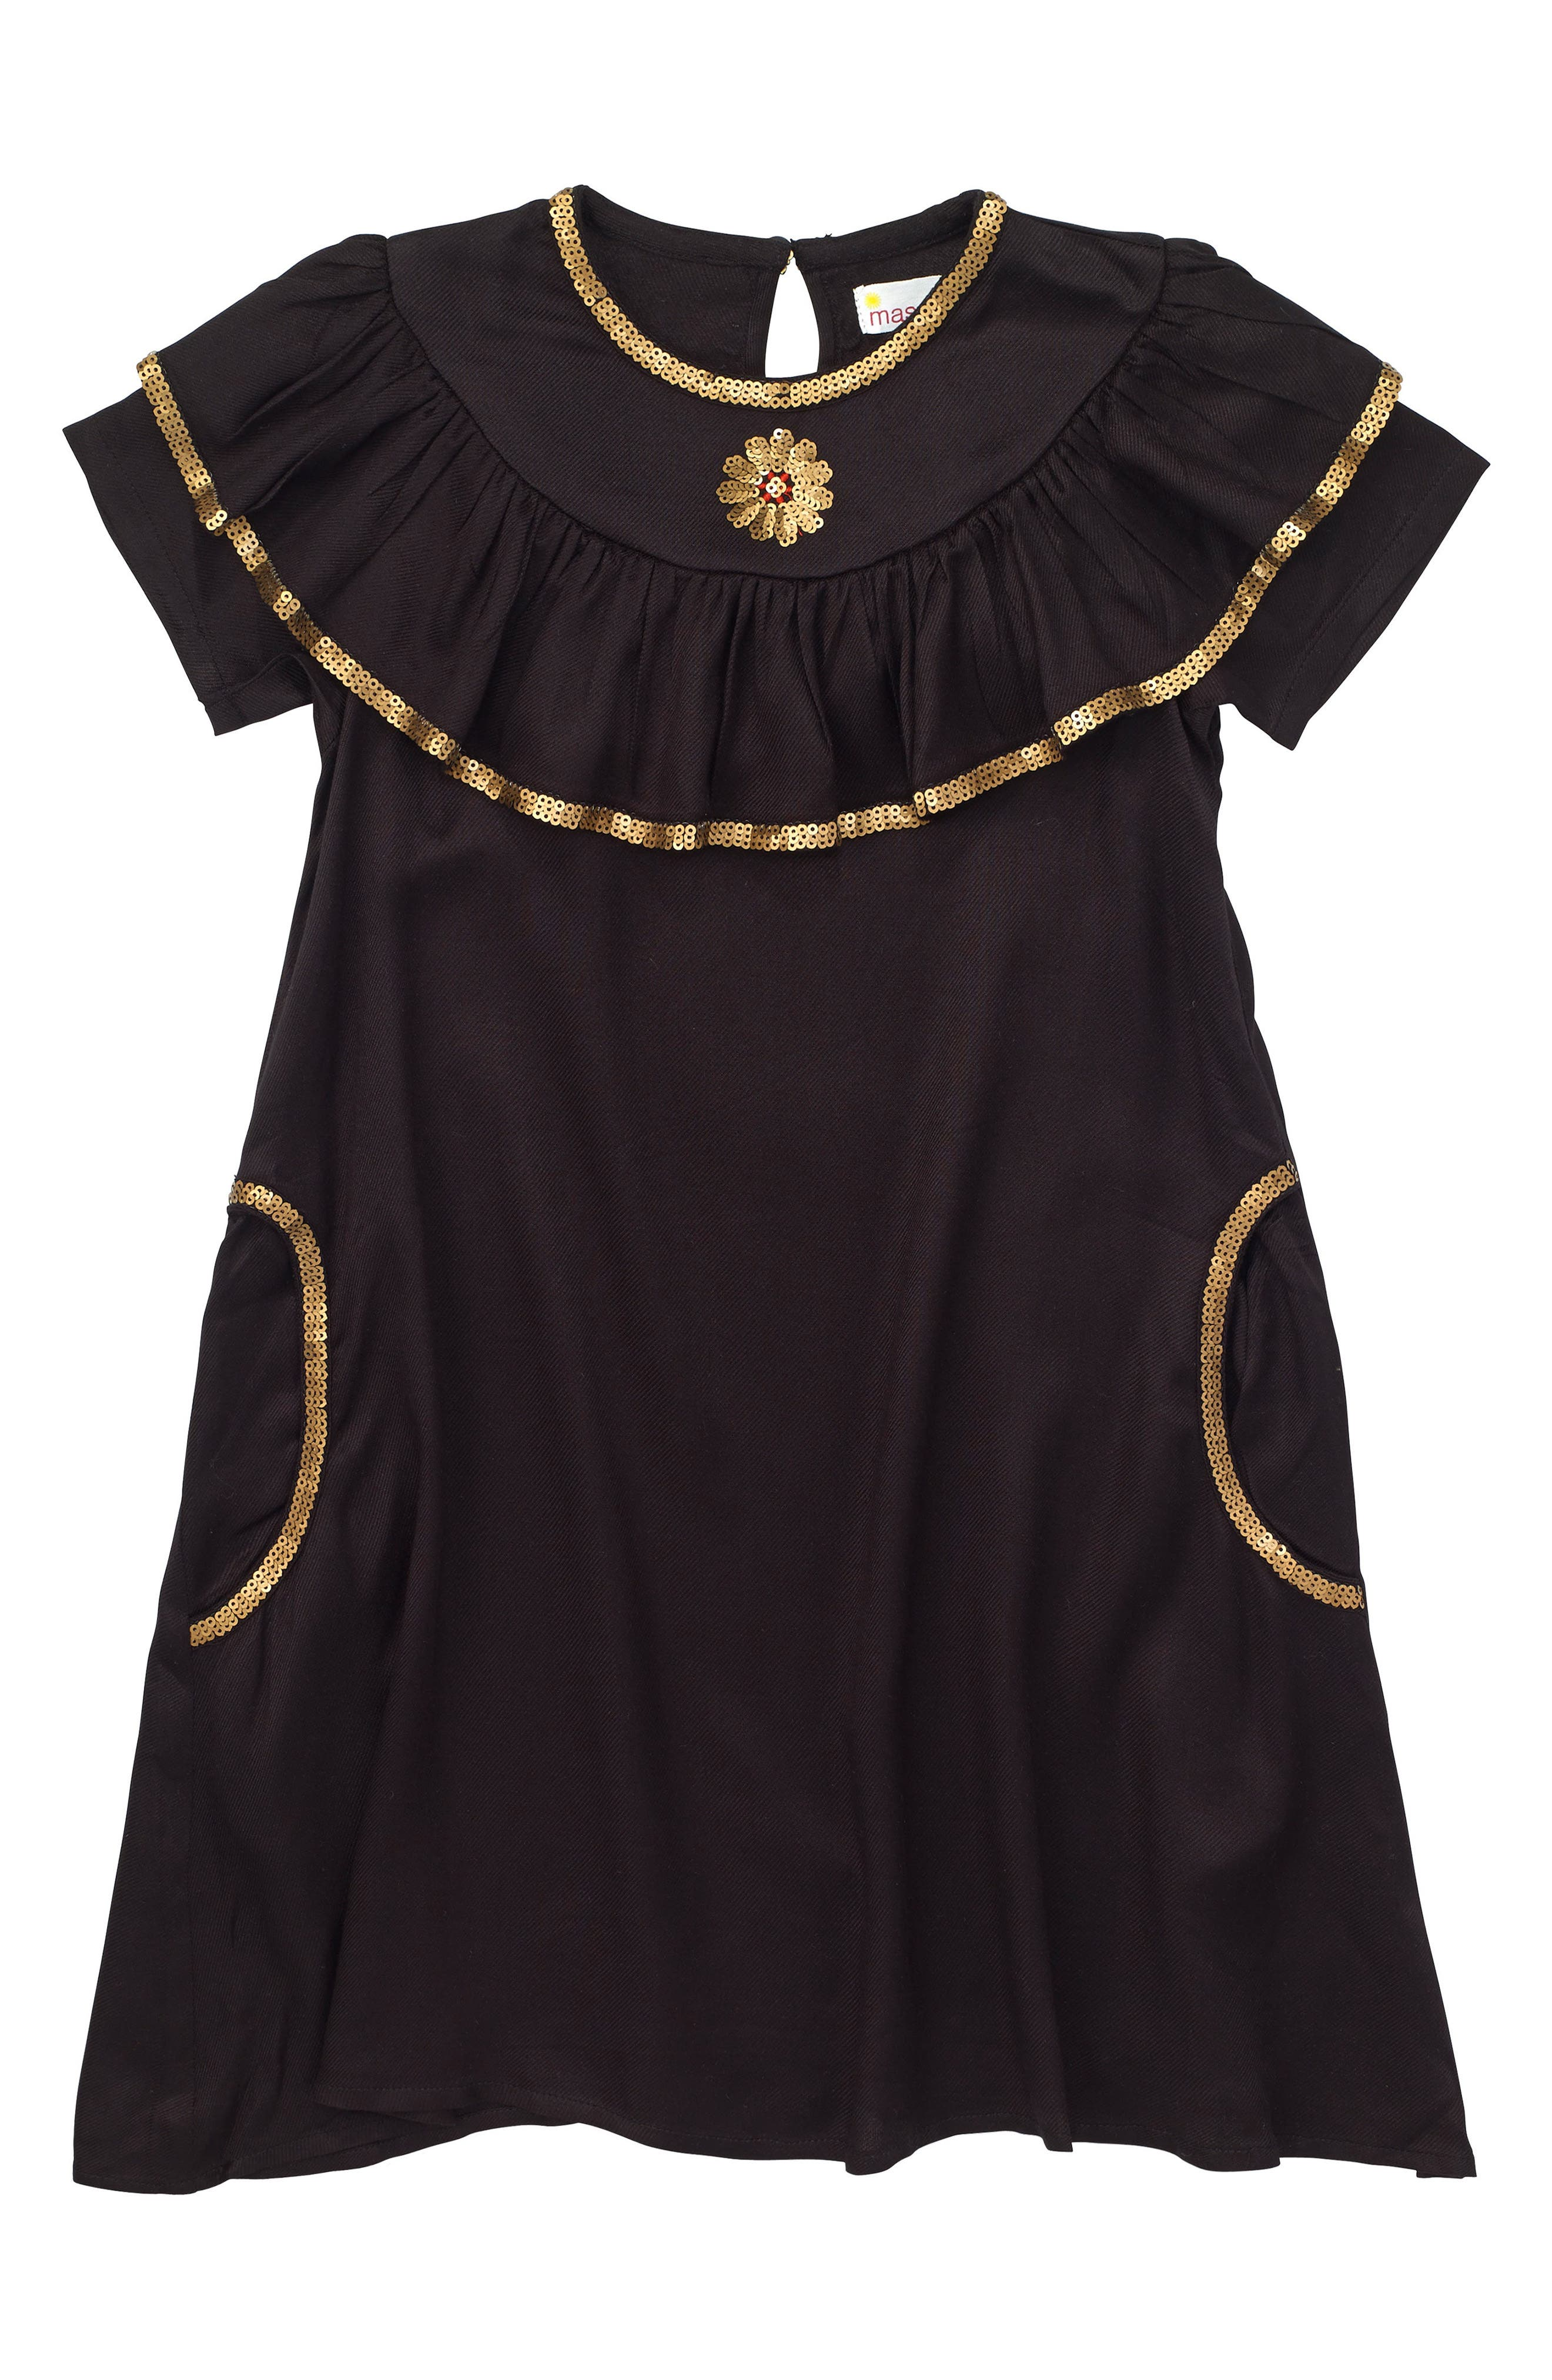 Alternate Image 1 Selected - Masalababy Enchanted Dress (Toddler Girls, Little Girls & Big Girls)